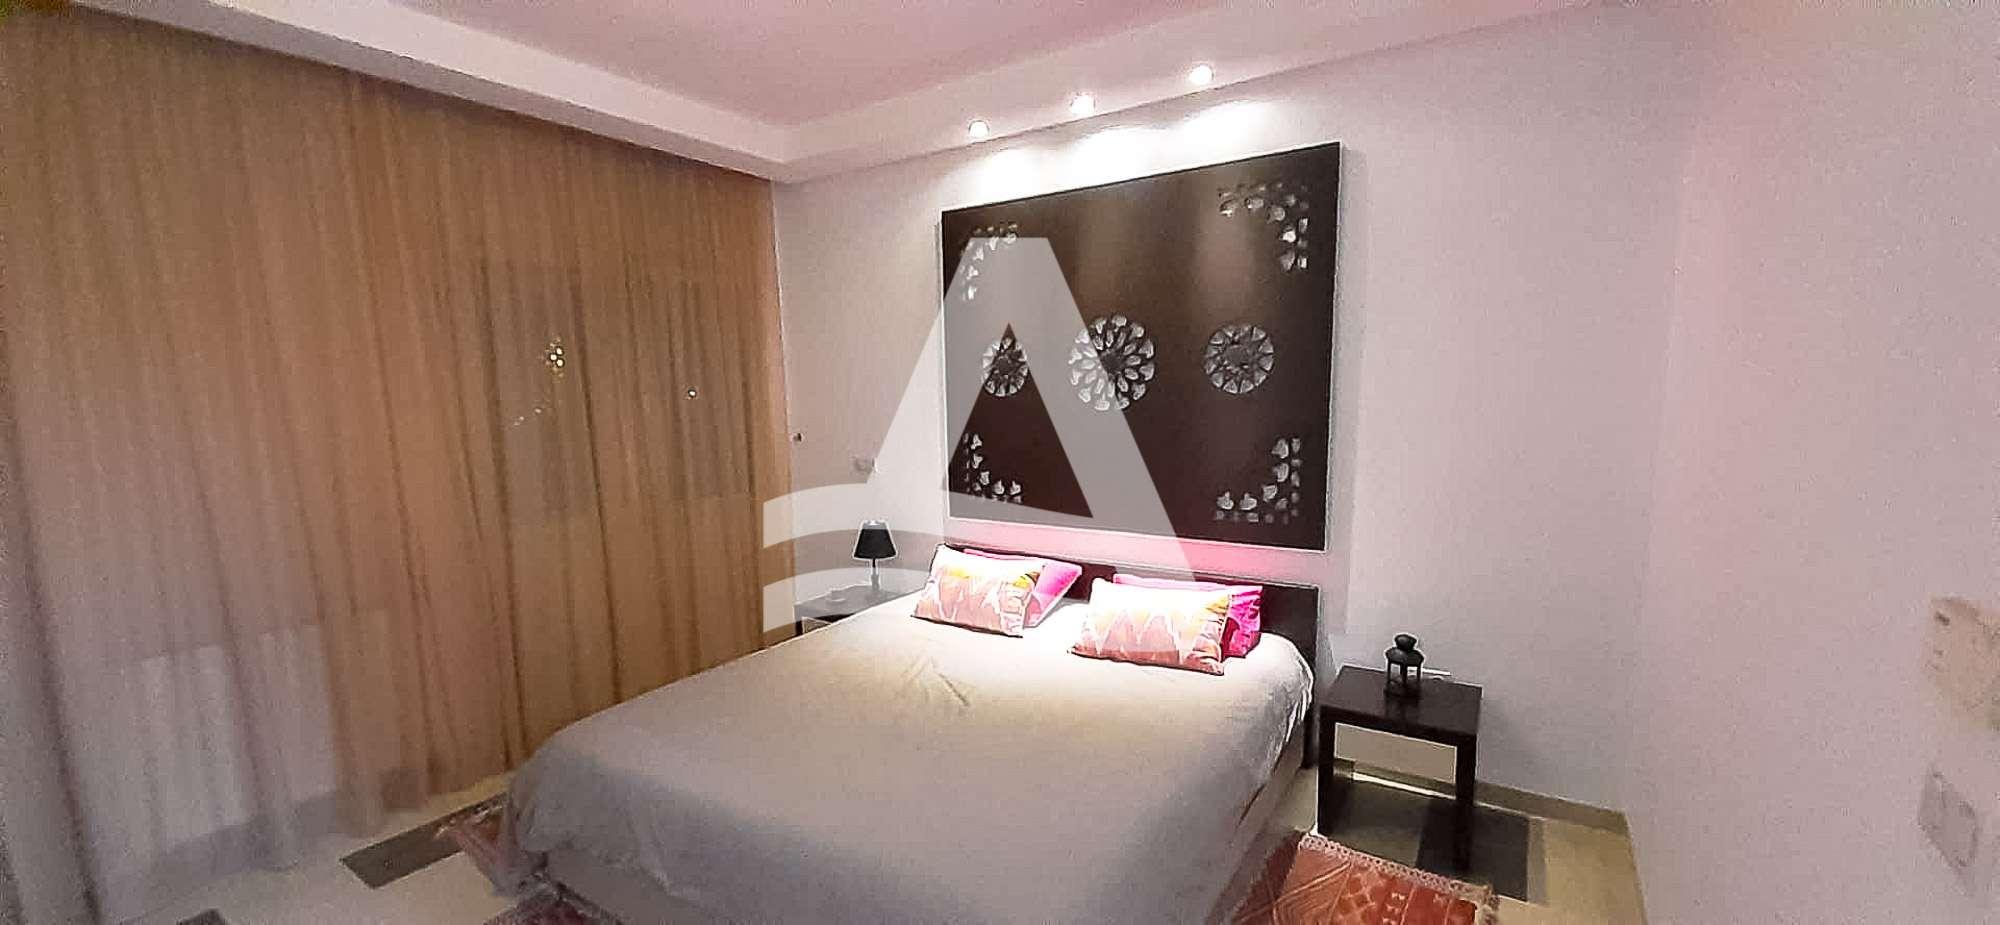 httpss3.amazonaws.comlogimoaws_Arcane_immobilière_la_Marsa-_location_-_vente_la_marsa_8_sur_12_1574867274162